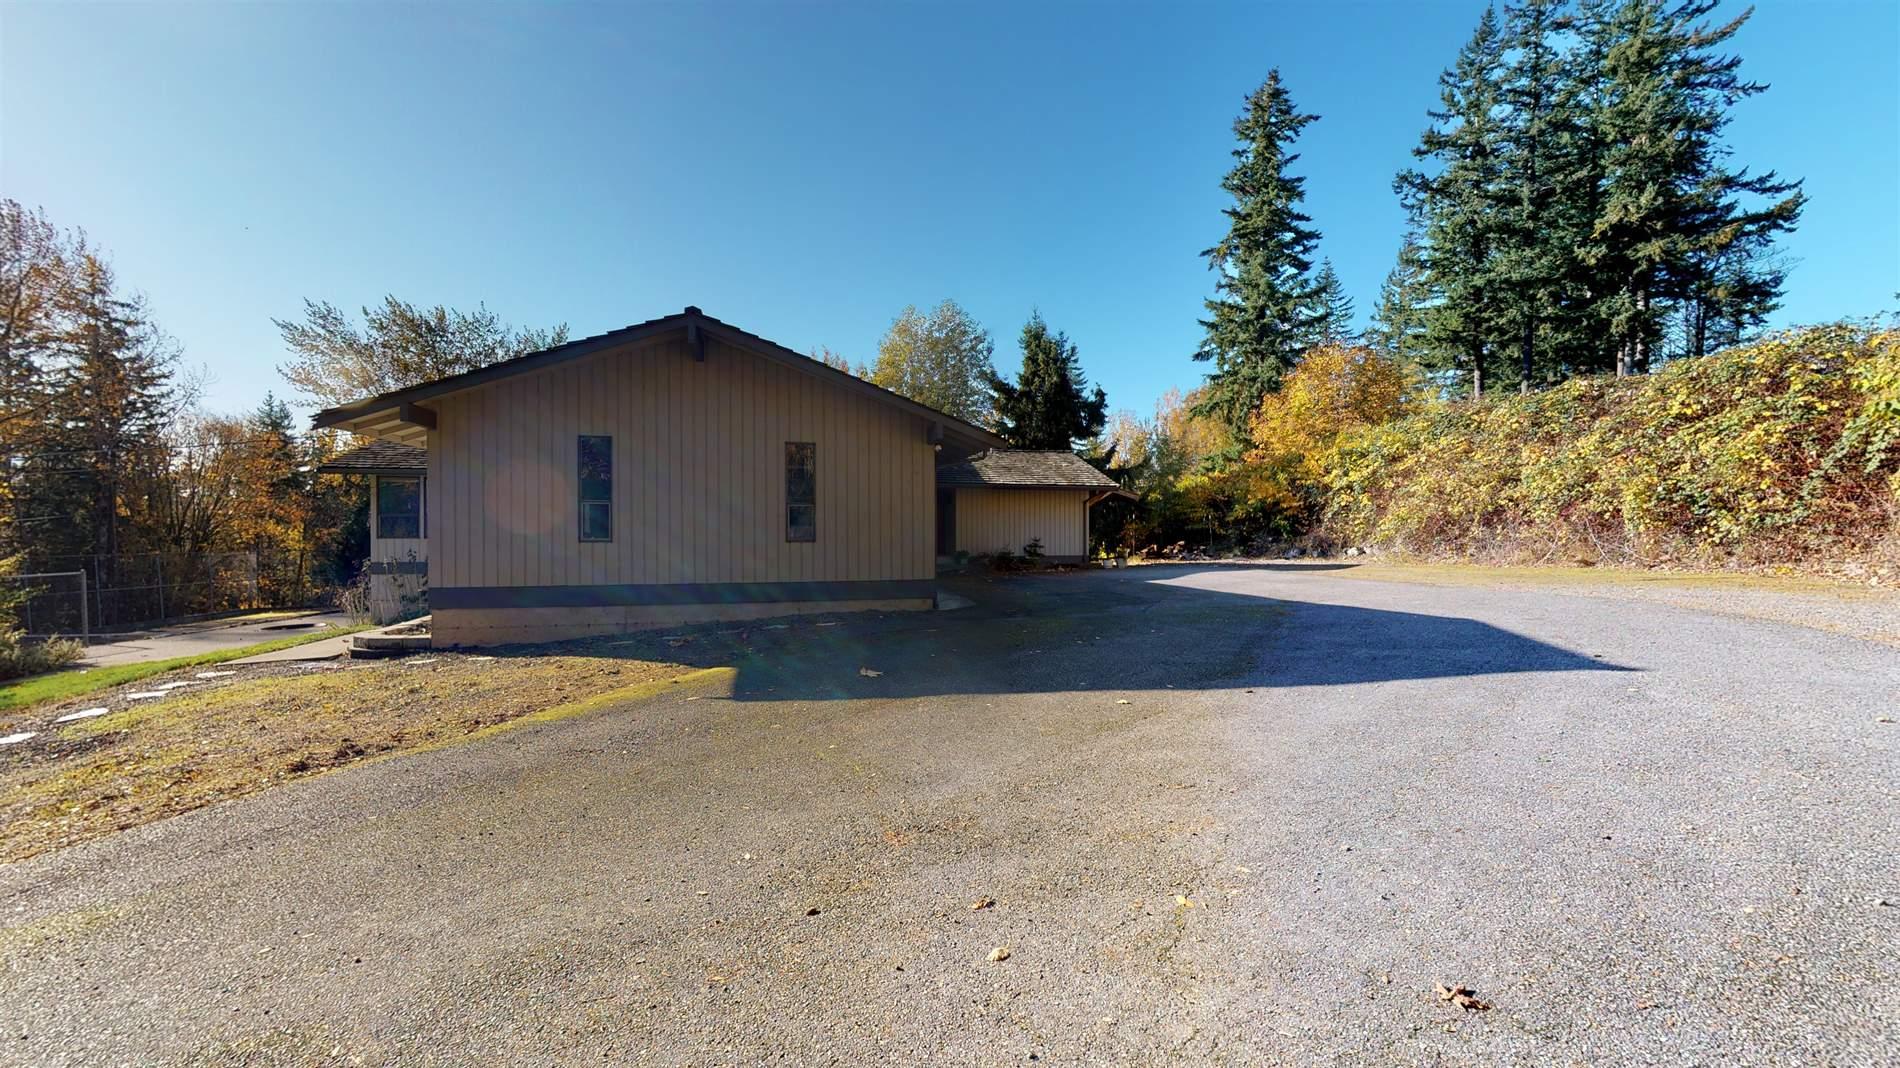 1864 Academy Rd, Bellingham, WA 98226